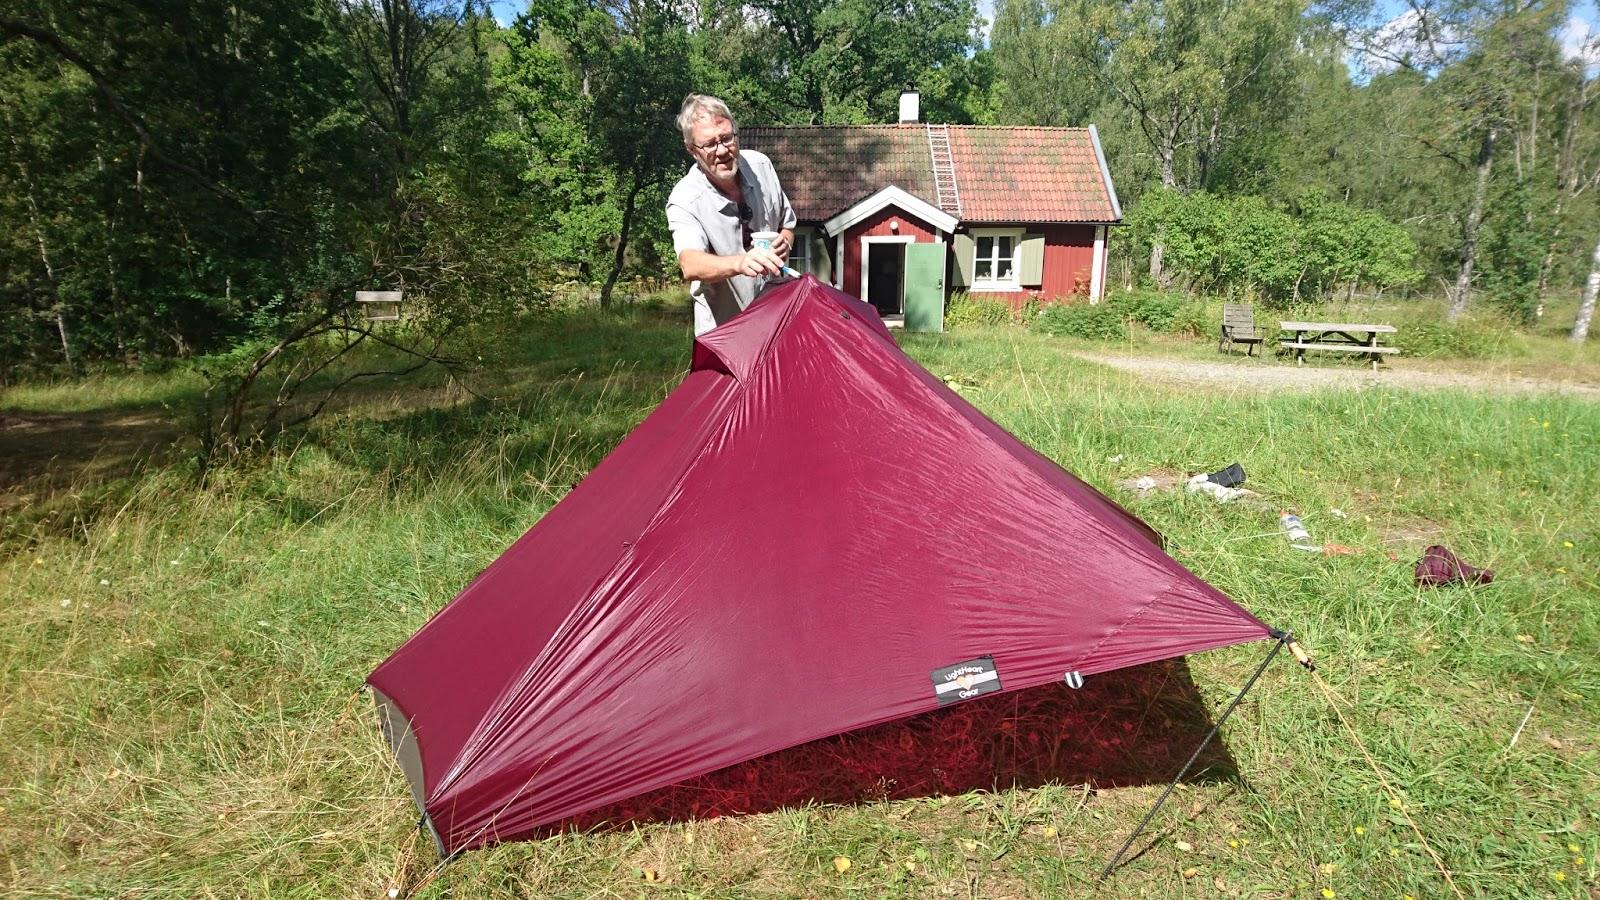 & Seam sealing a tent